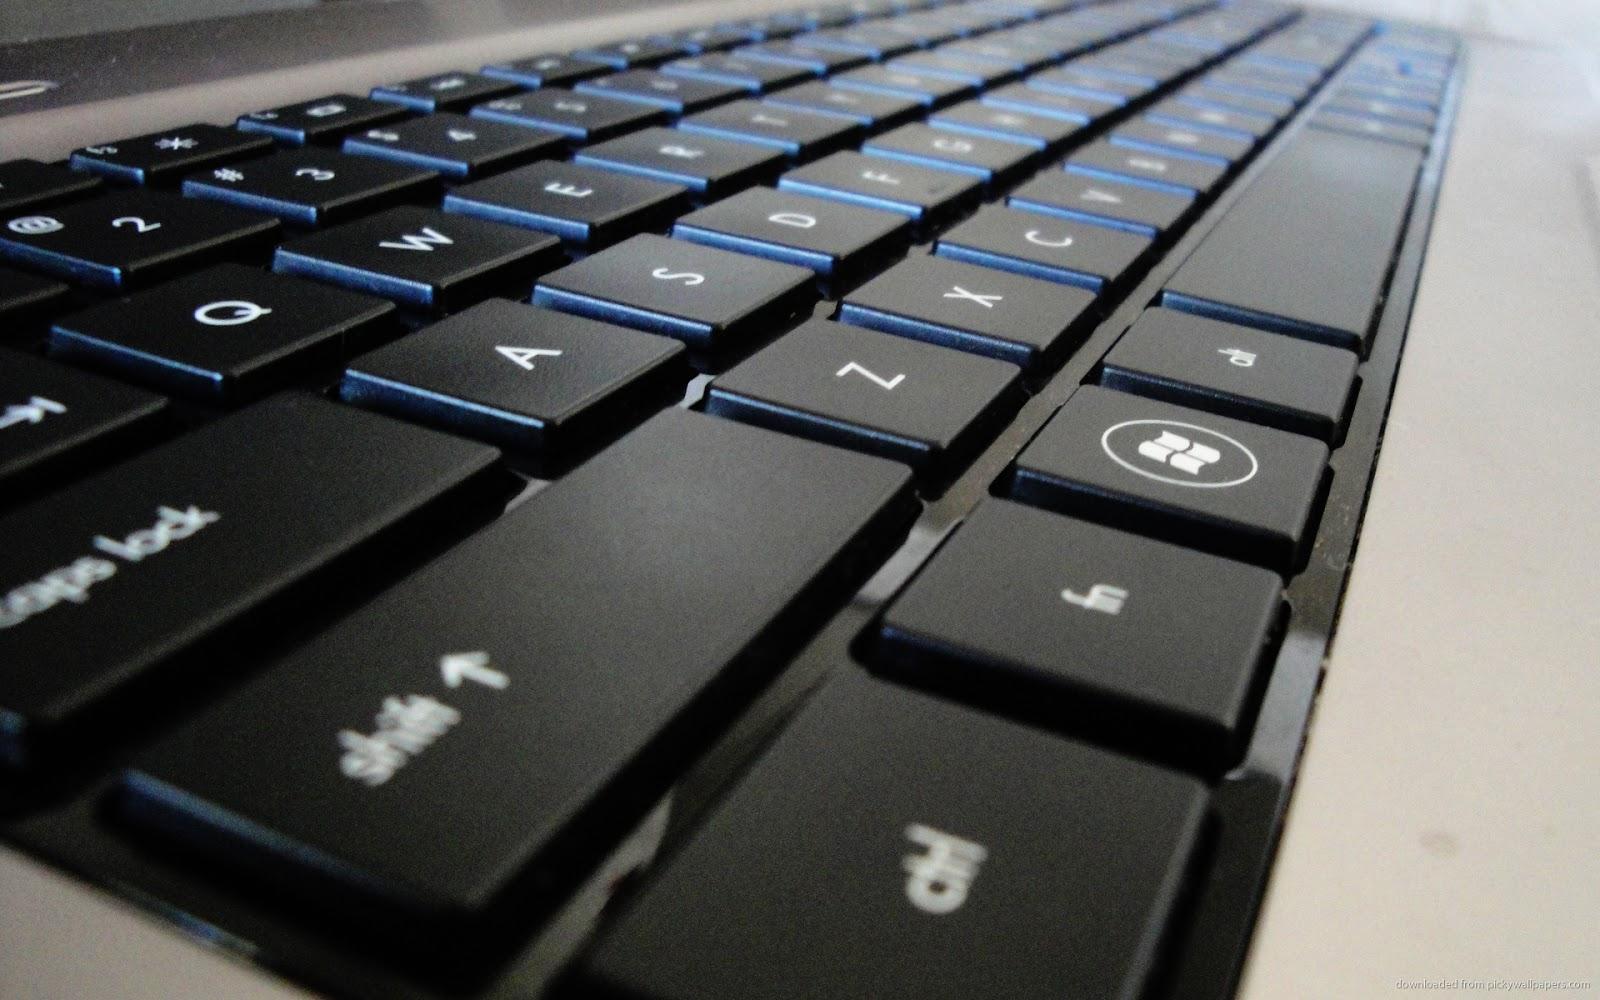 cara membersihkan keyboard komputer atau laptop